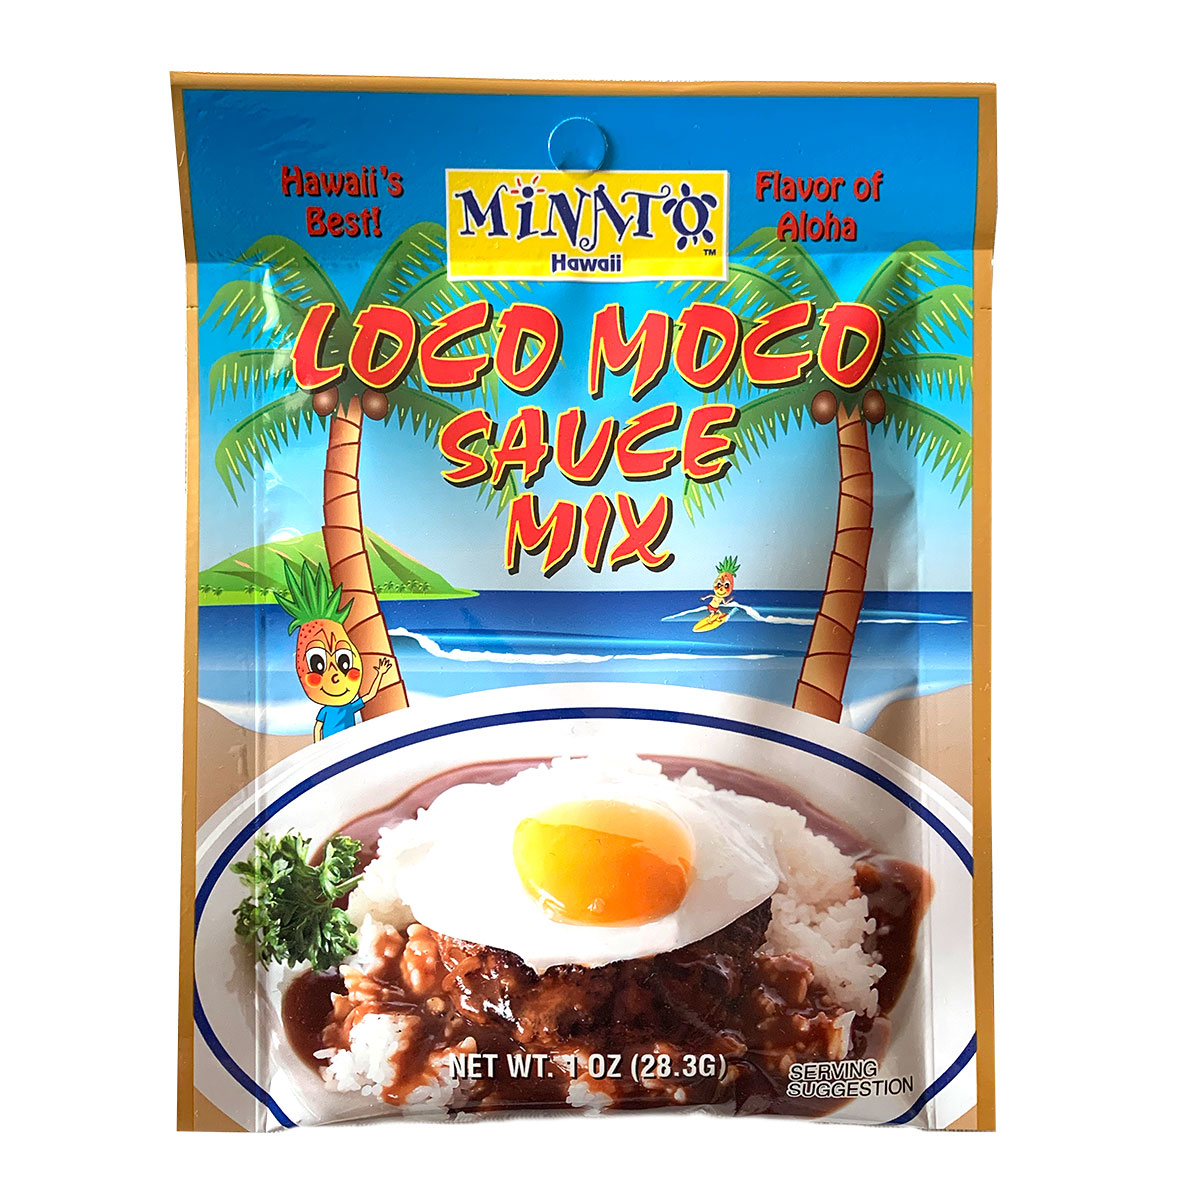 Loco Moco Sauce Mix Minato S Hawaii